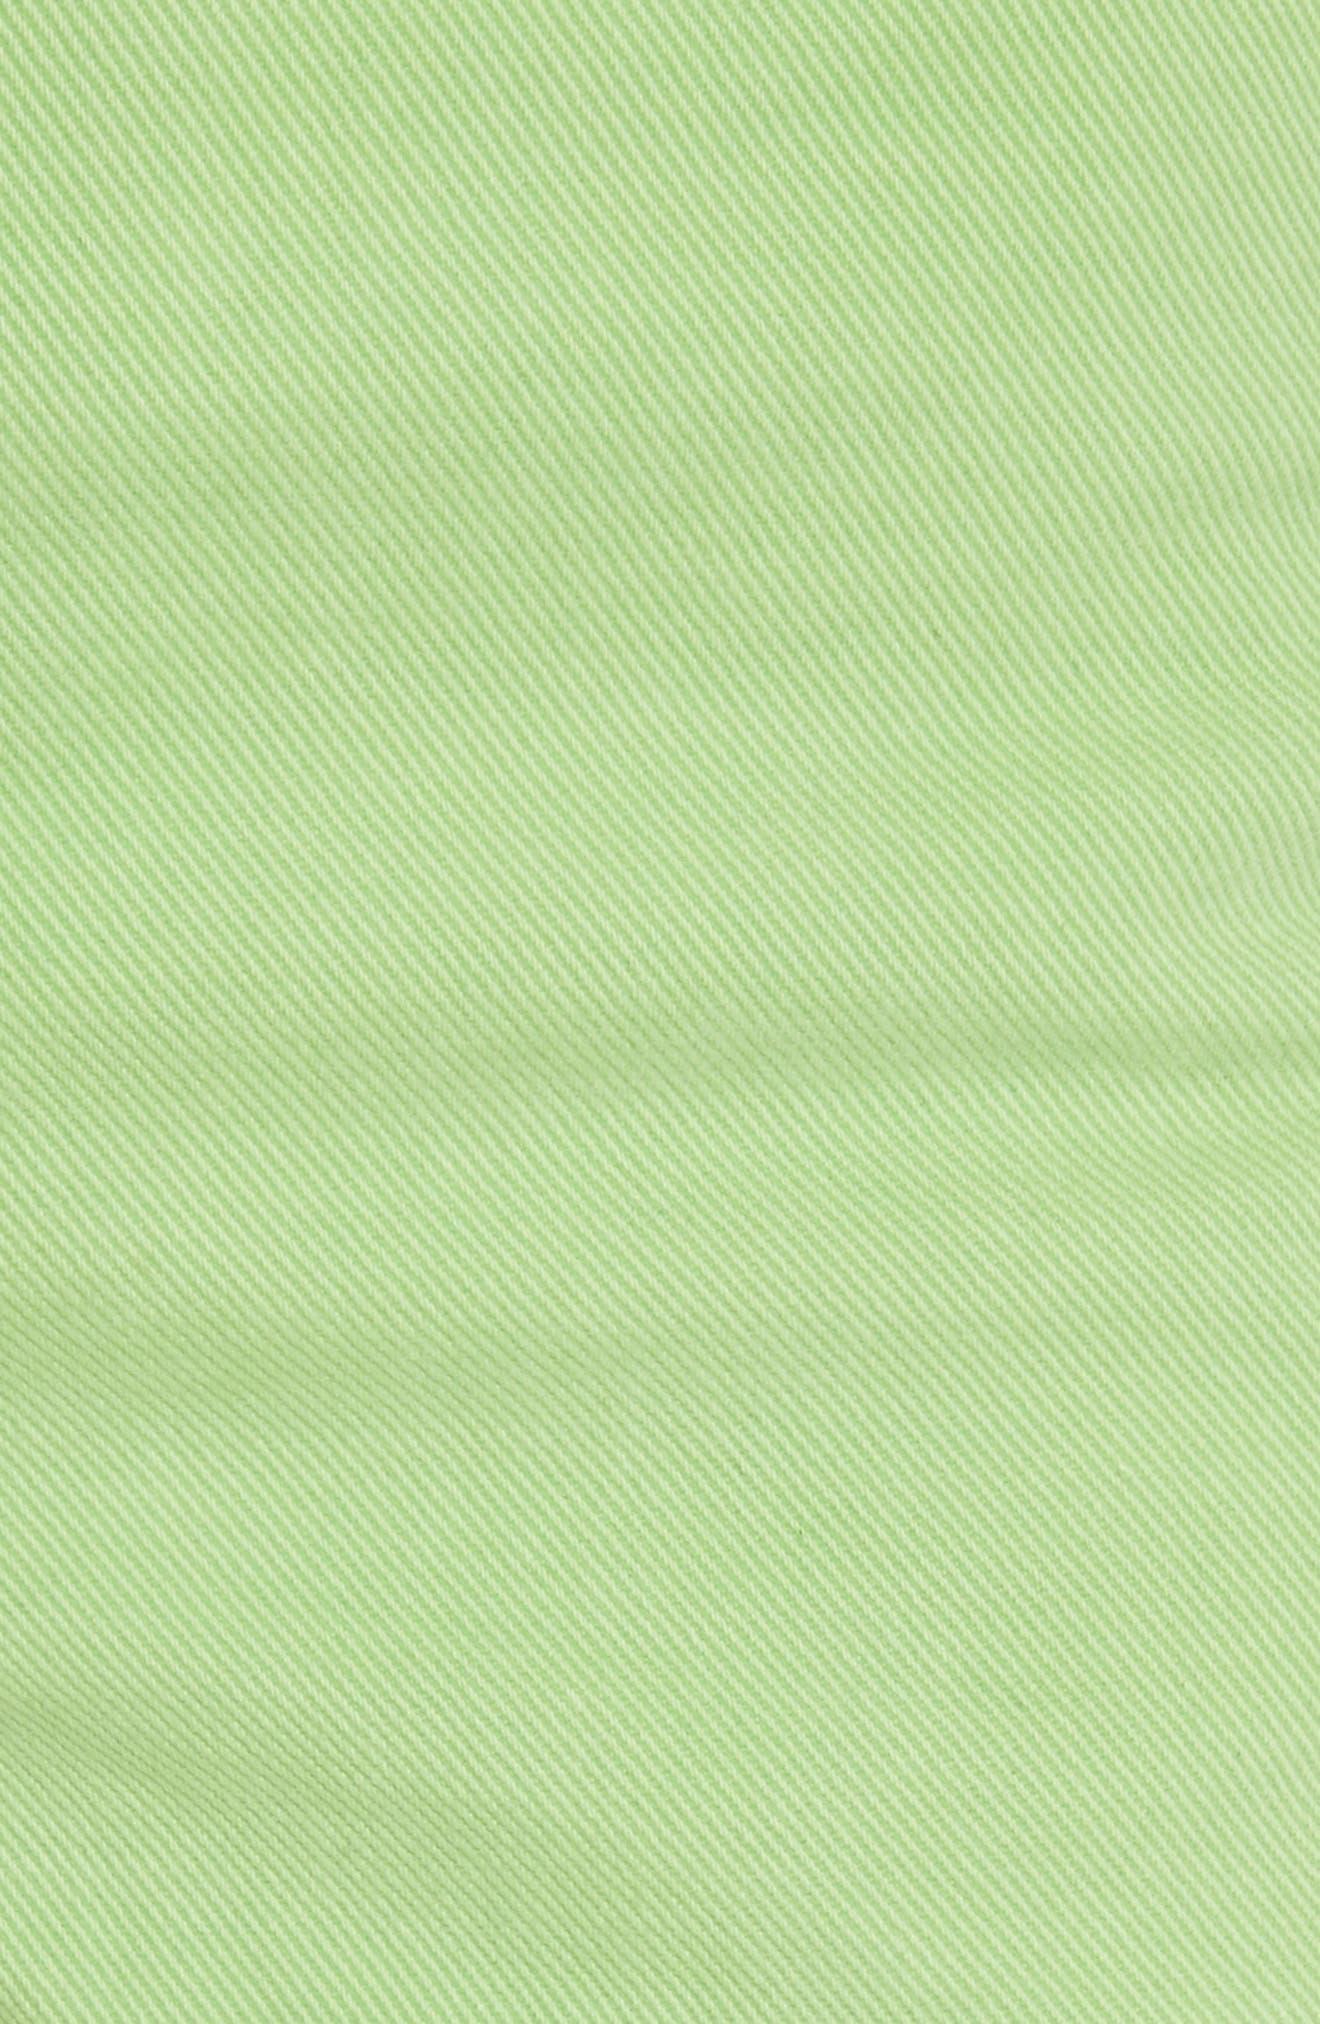 Justine High Waist Denim Shorts,                             Alternate thumbnail 6, color,                             Lime